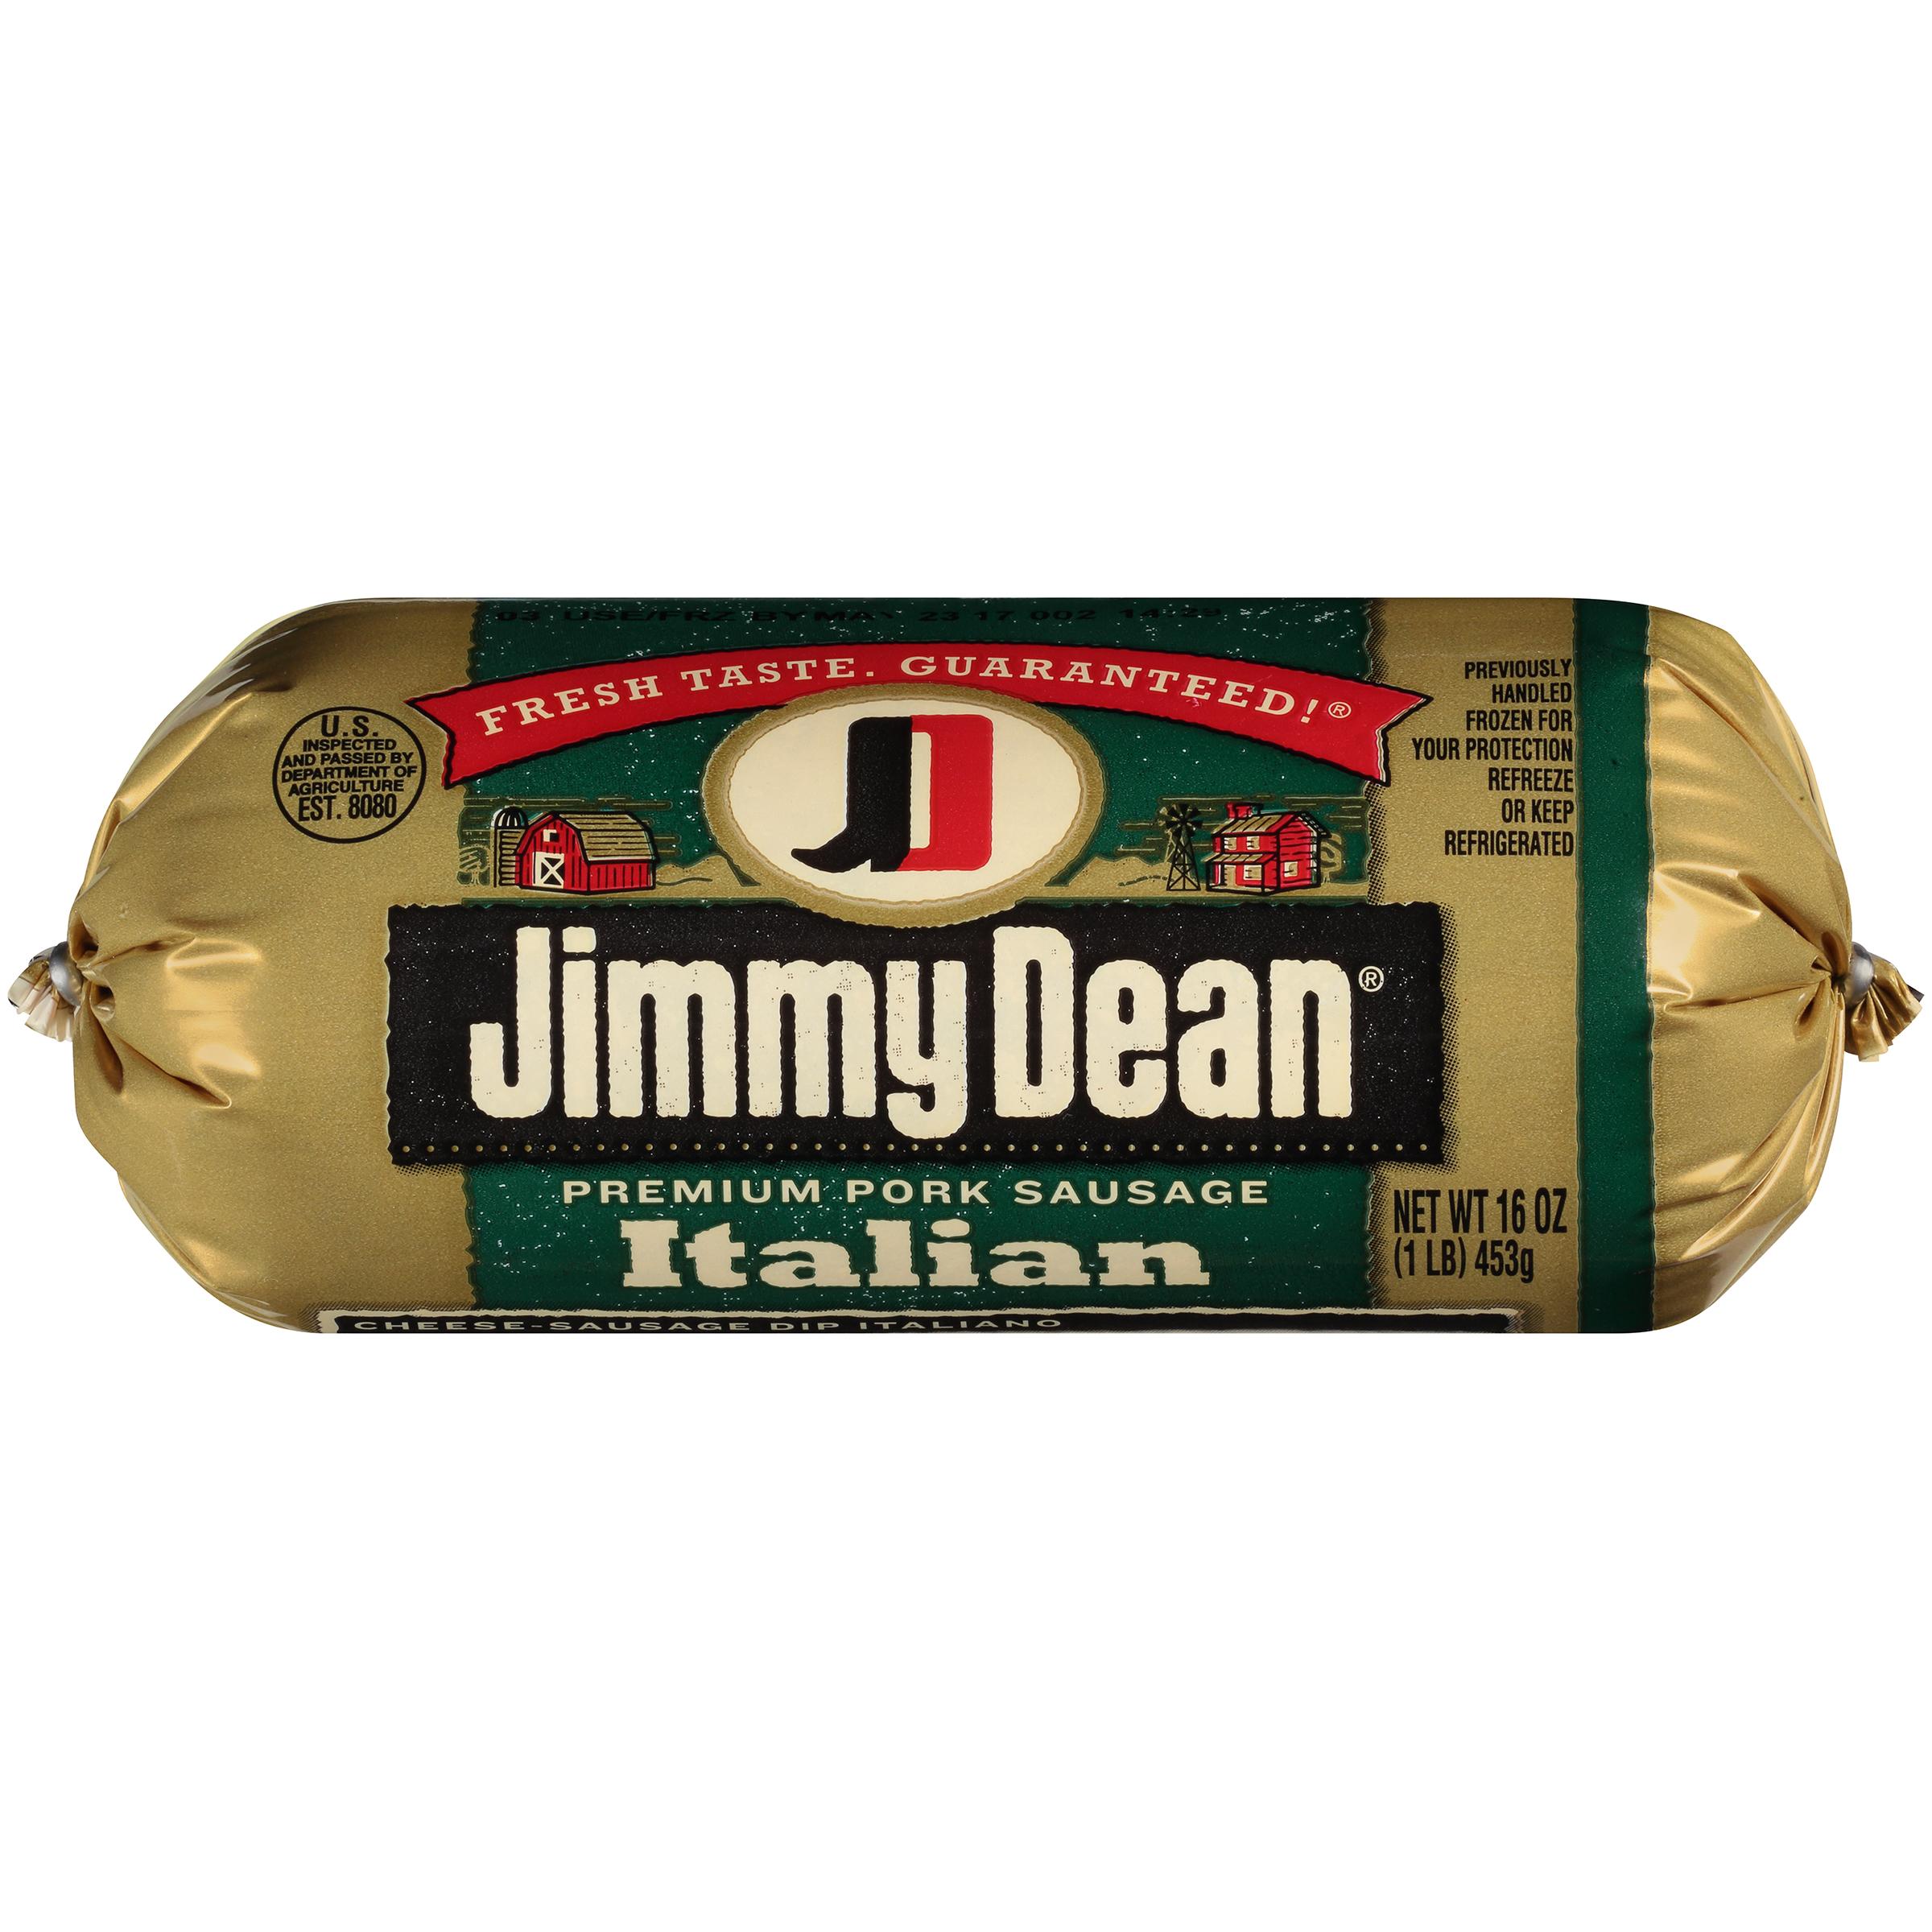 Jimmy Dean Italian Premium Pork Sausage, 16 oz